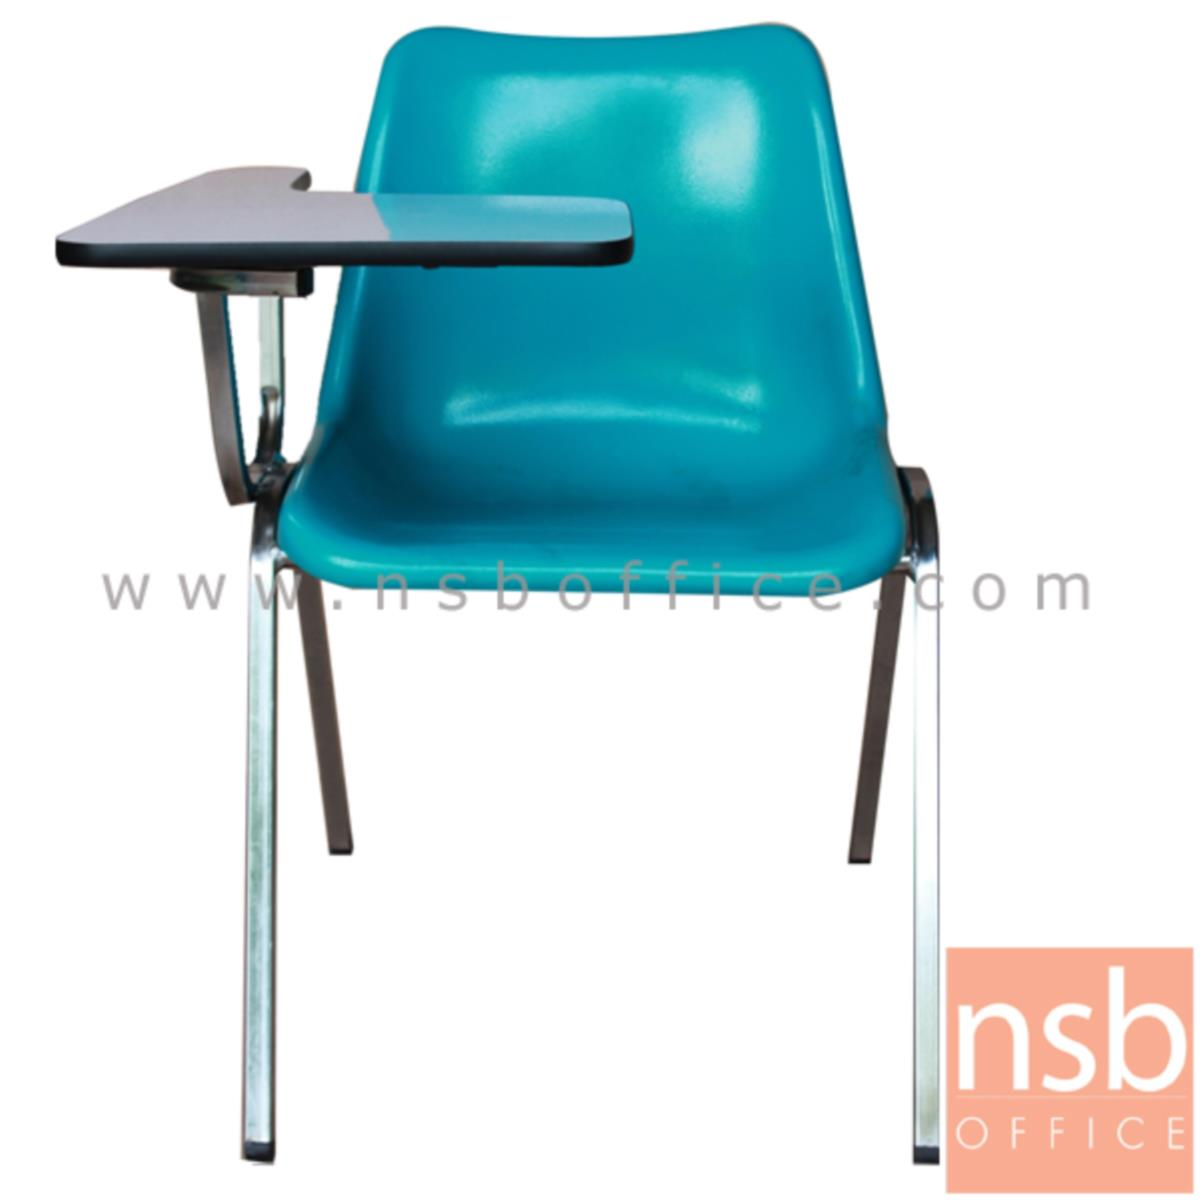 B07A003:เก้าอี้เลคเชอร์เฟรมโพลี่ รุ่น Clarins (คลาแรงส์) ขาเหล็กชุบโครเมี่ยมและขาเหล็กพ่นดำ